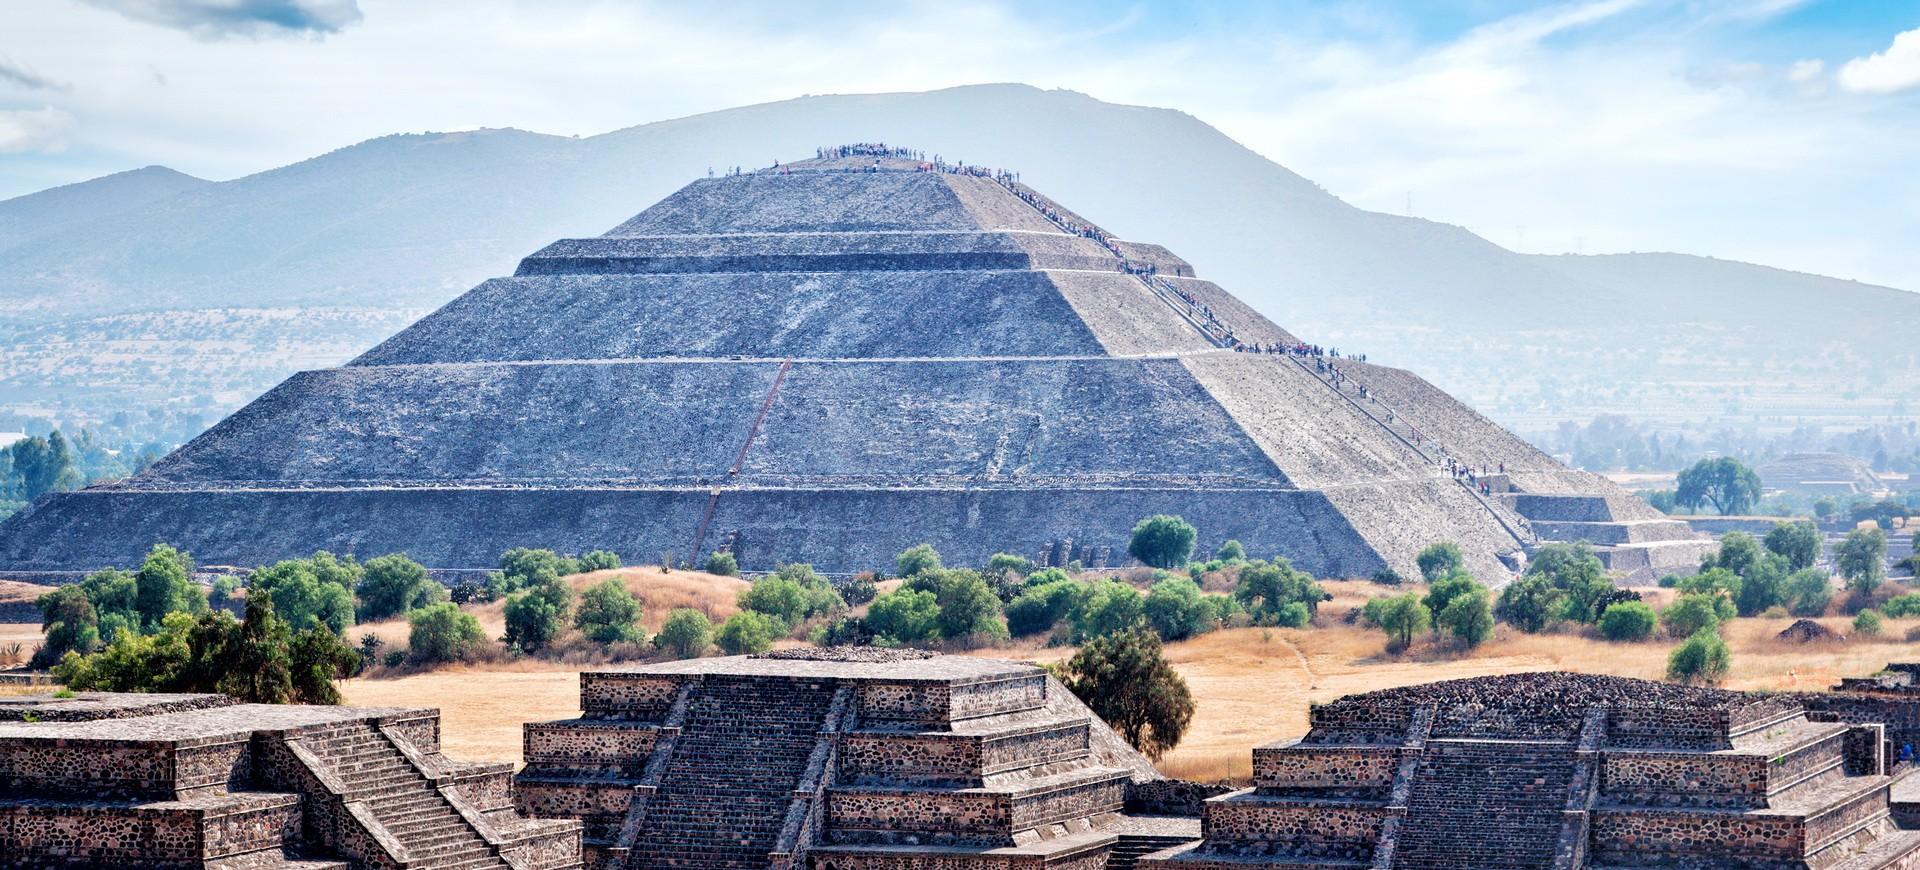 Pyramide Aztèque à Teotihuacan